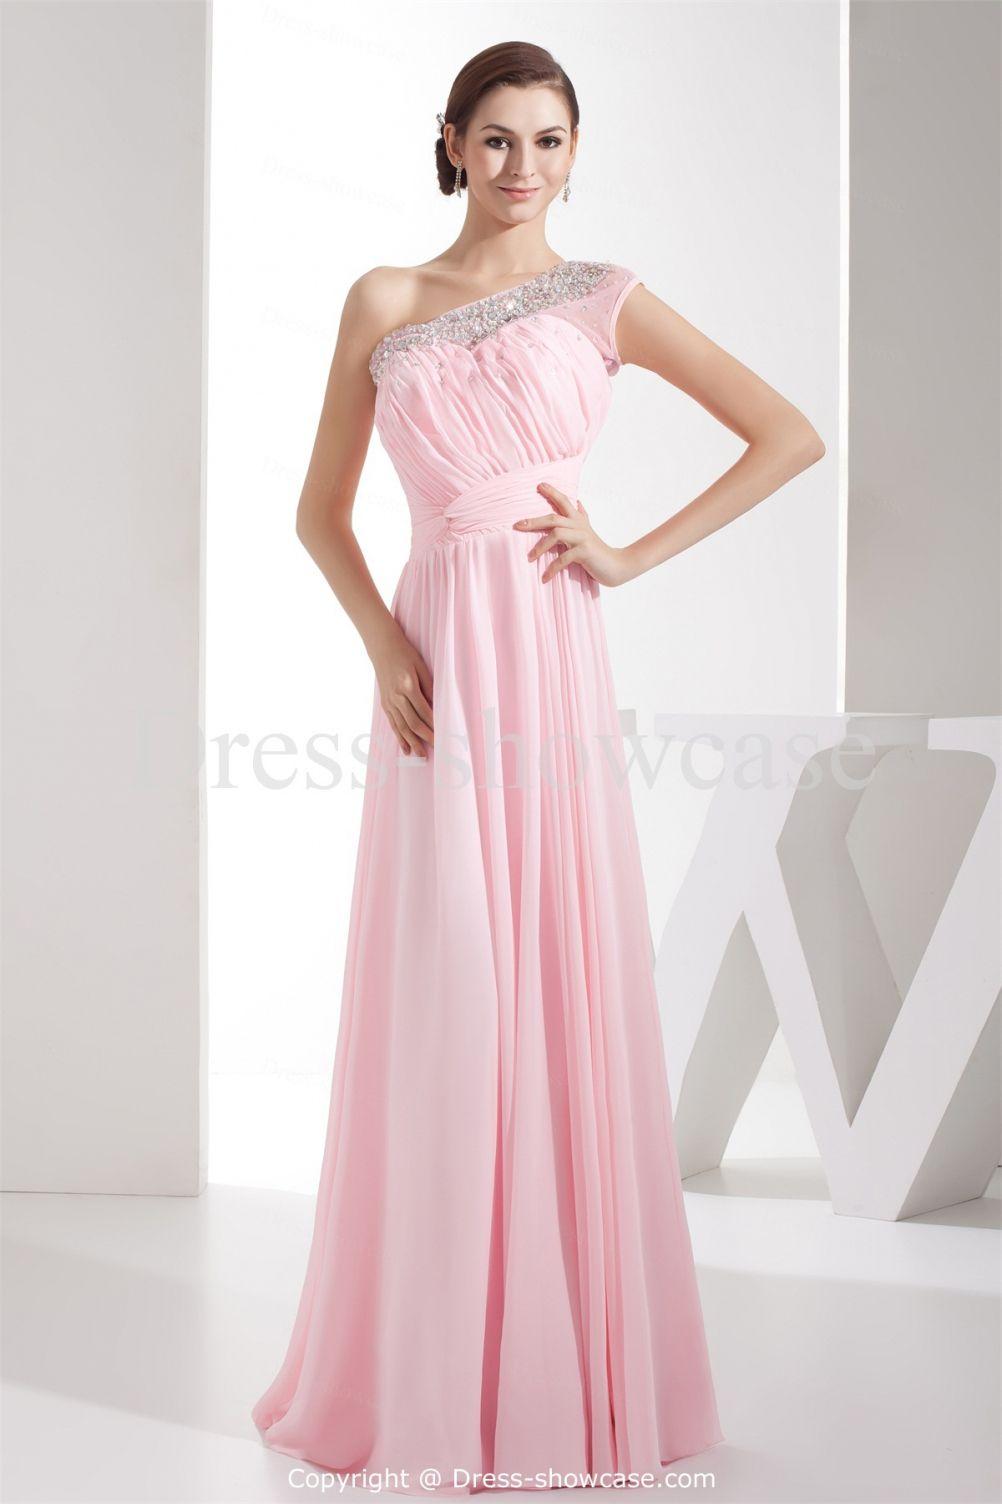 Light pink dresses for wedding wedding dresses for cheap check